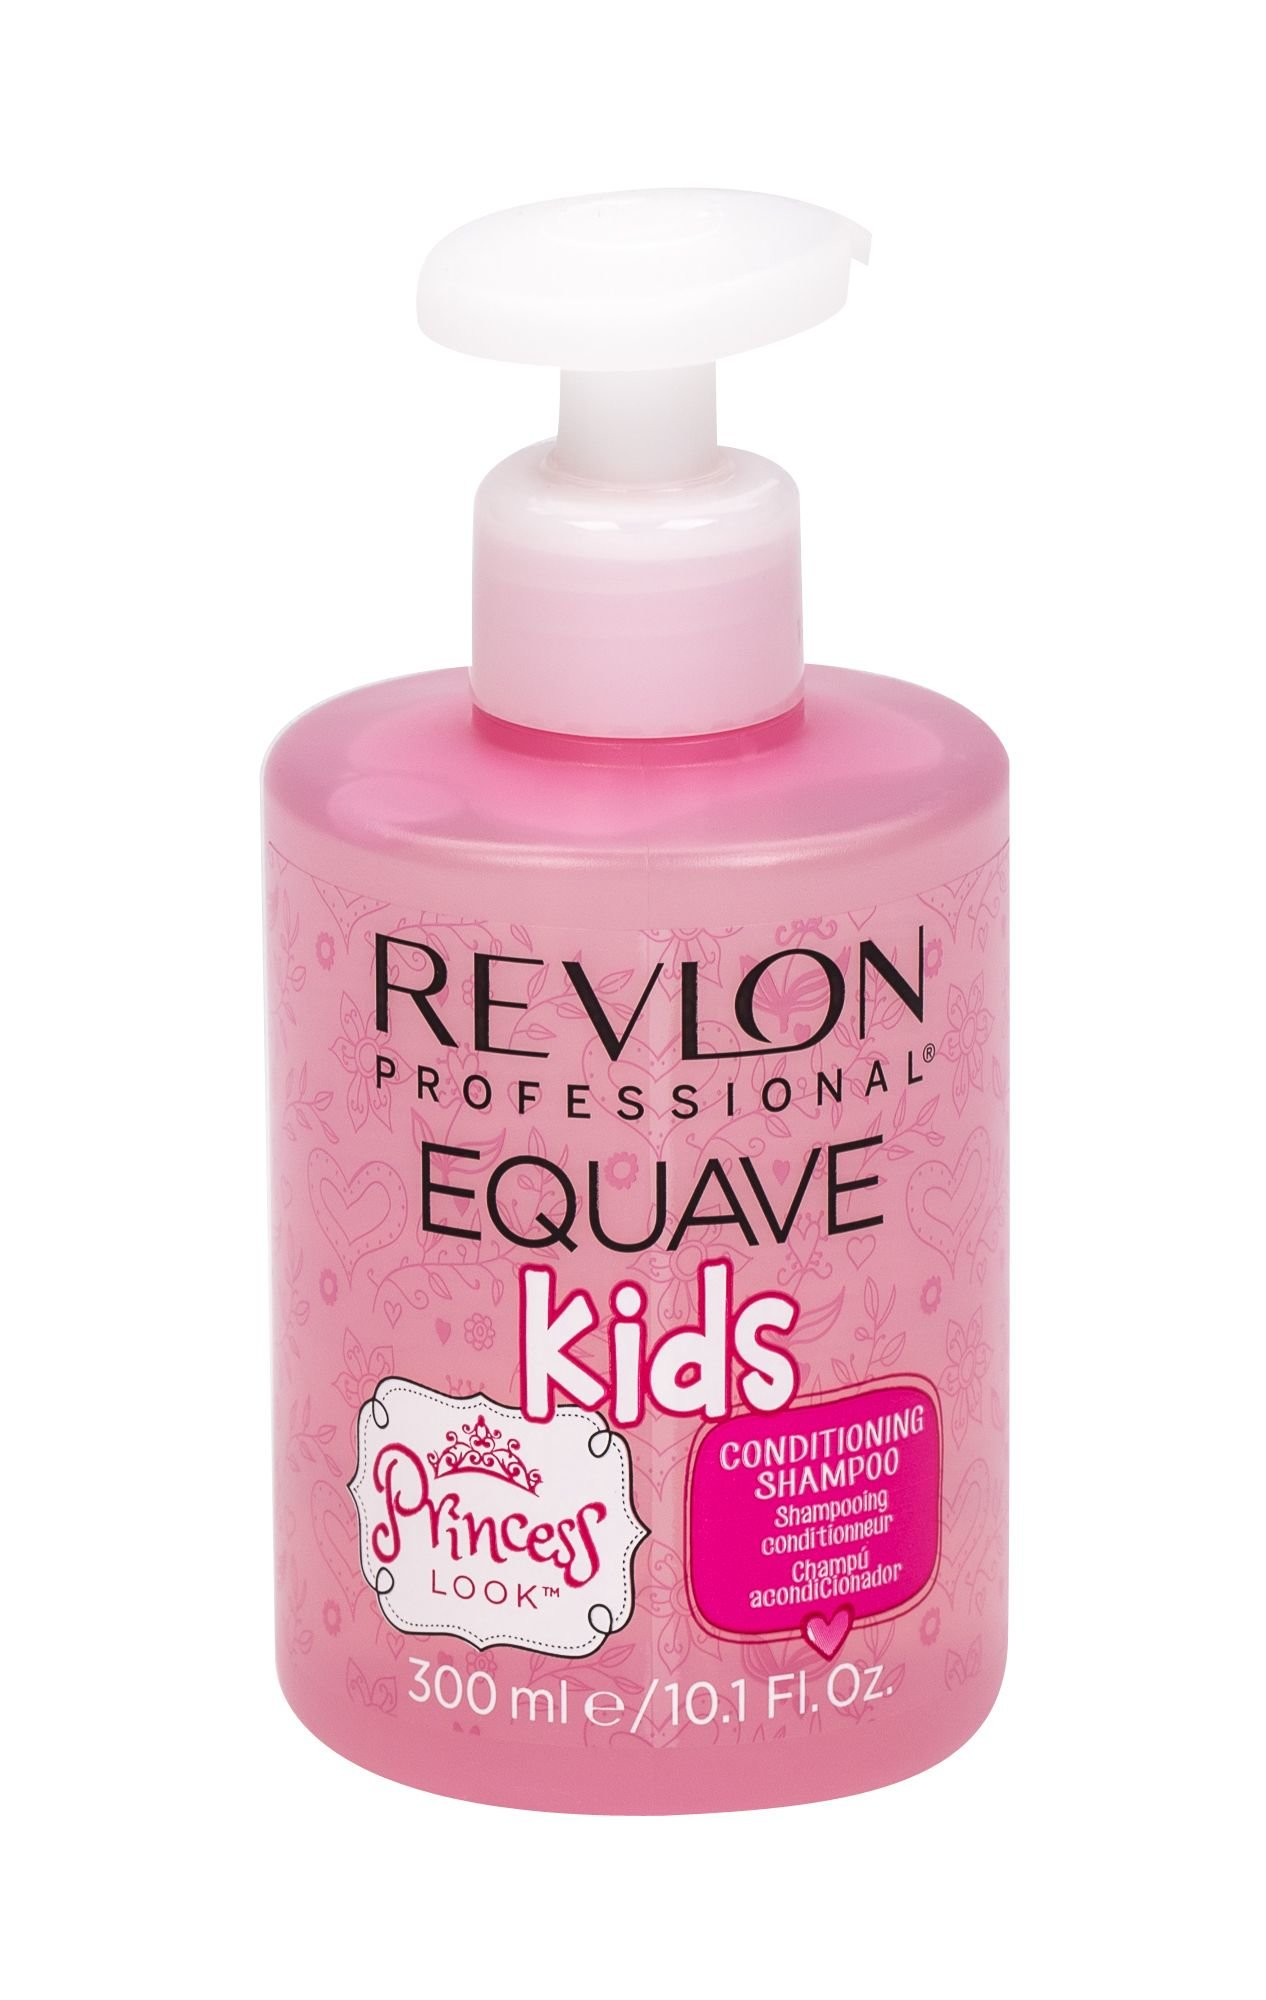 Revlon Professional Equave Shampoo 300ml